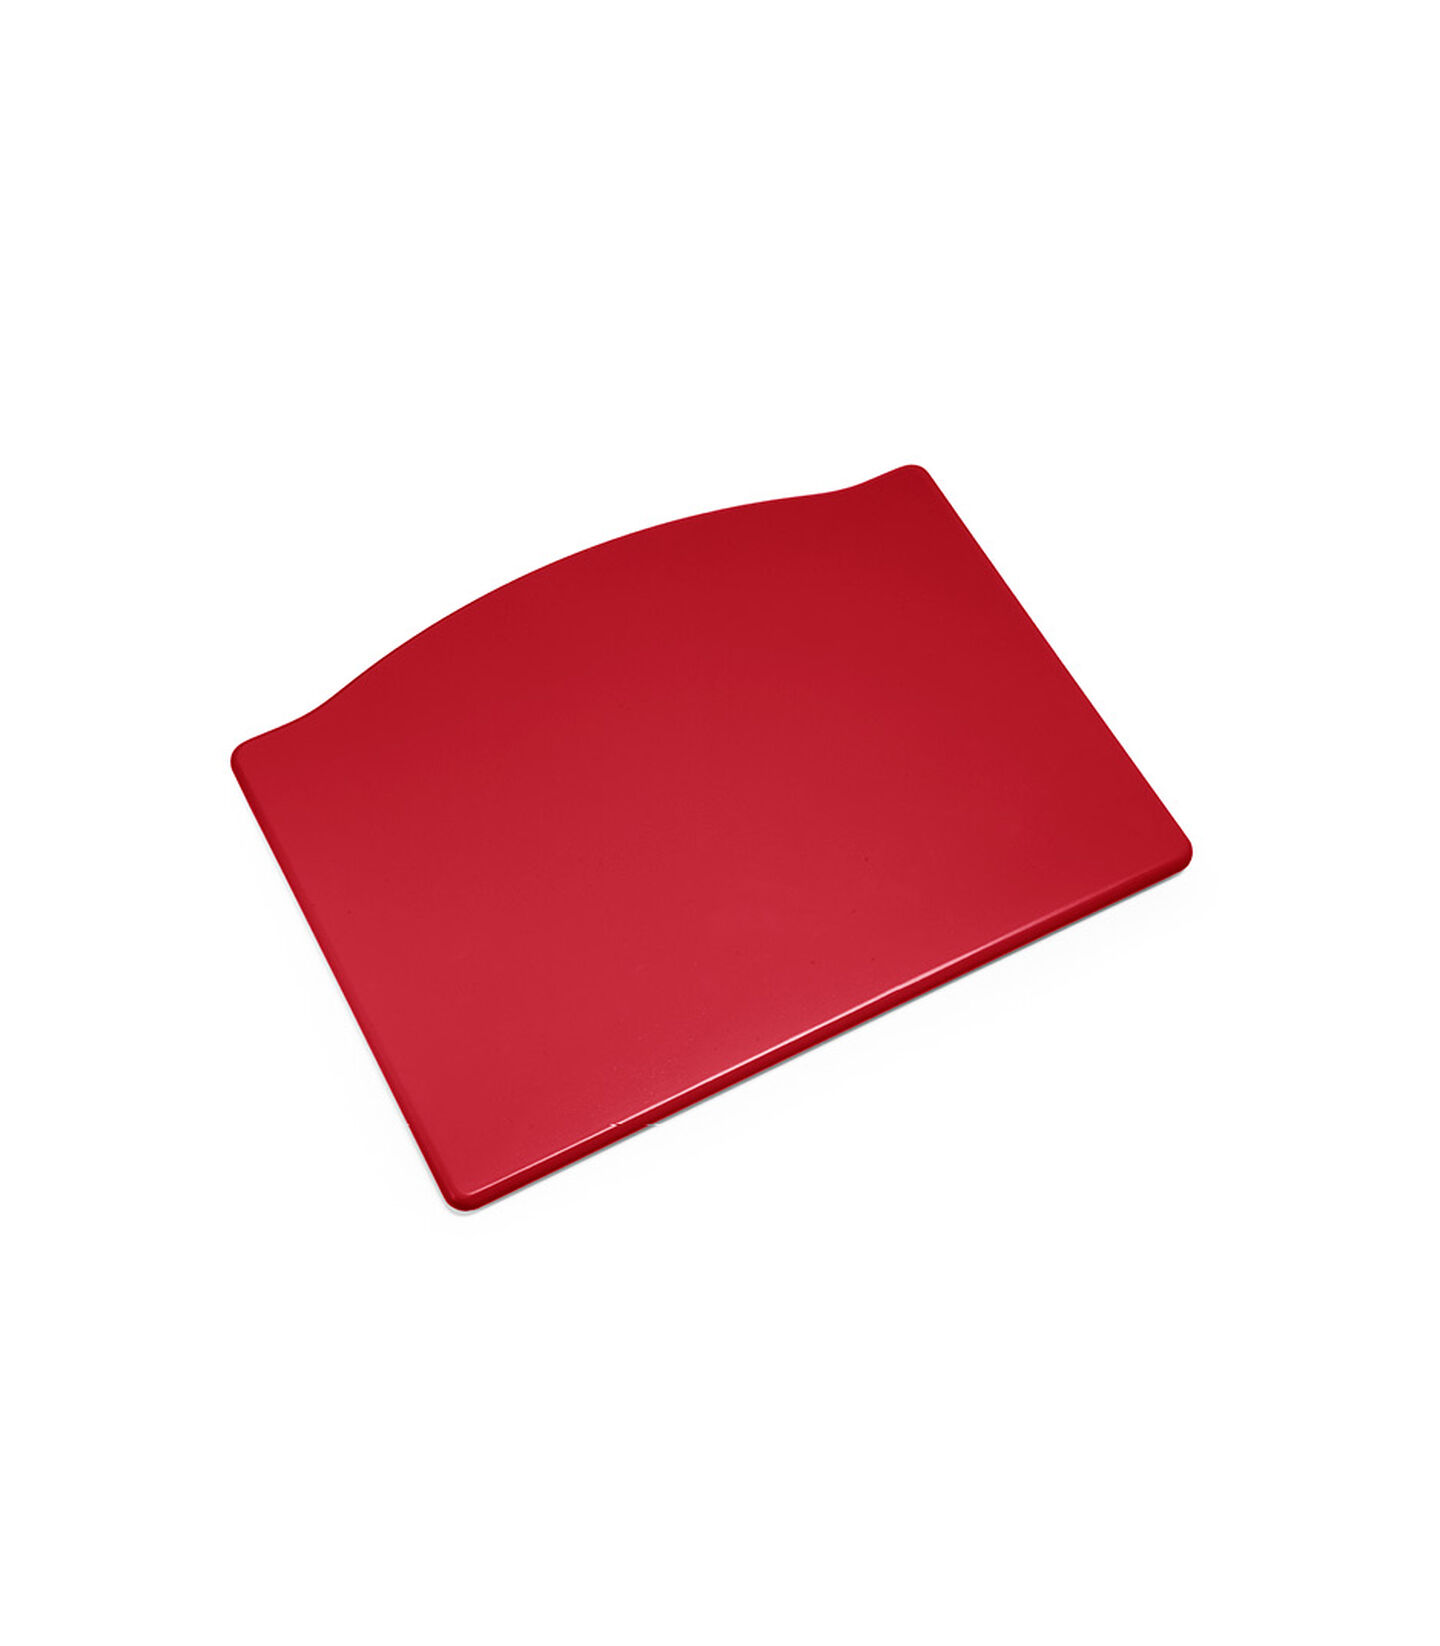 Tripp Trapp® Footplate Rojo, Rojo, mainview view 2